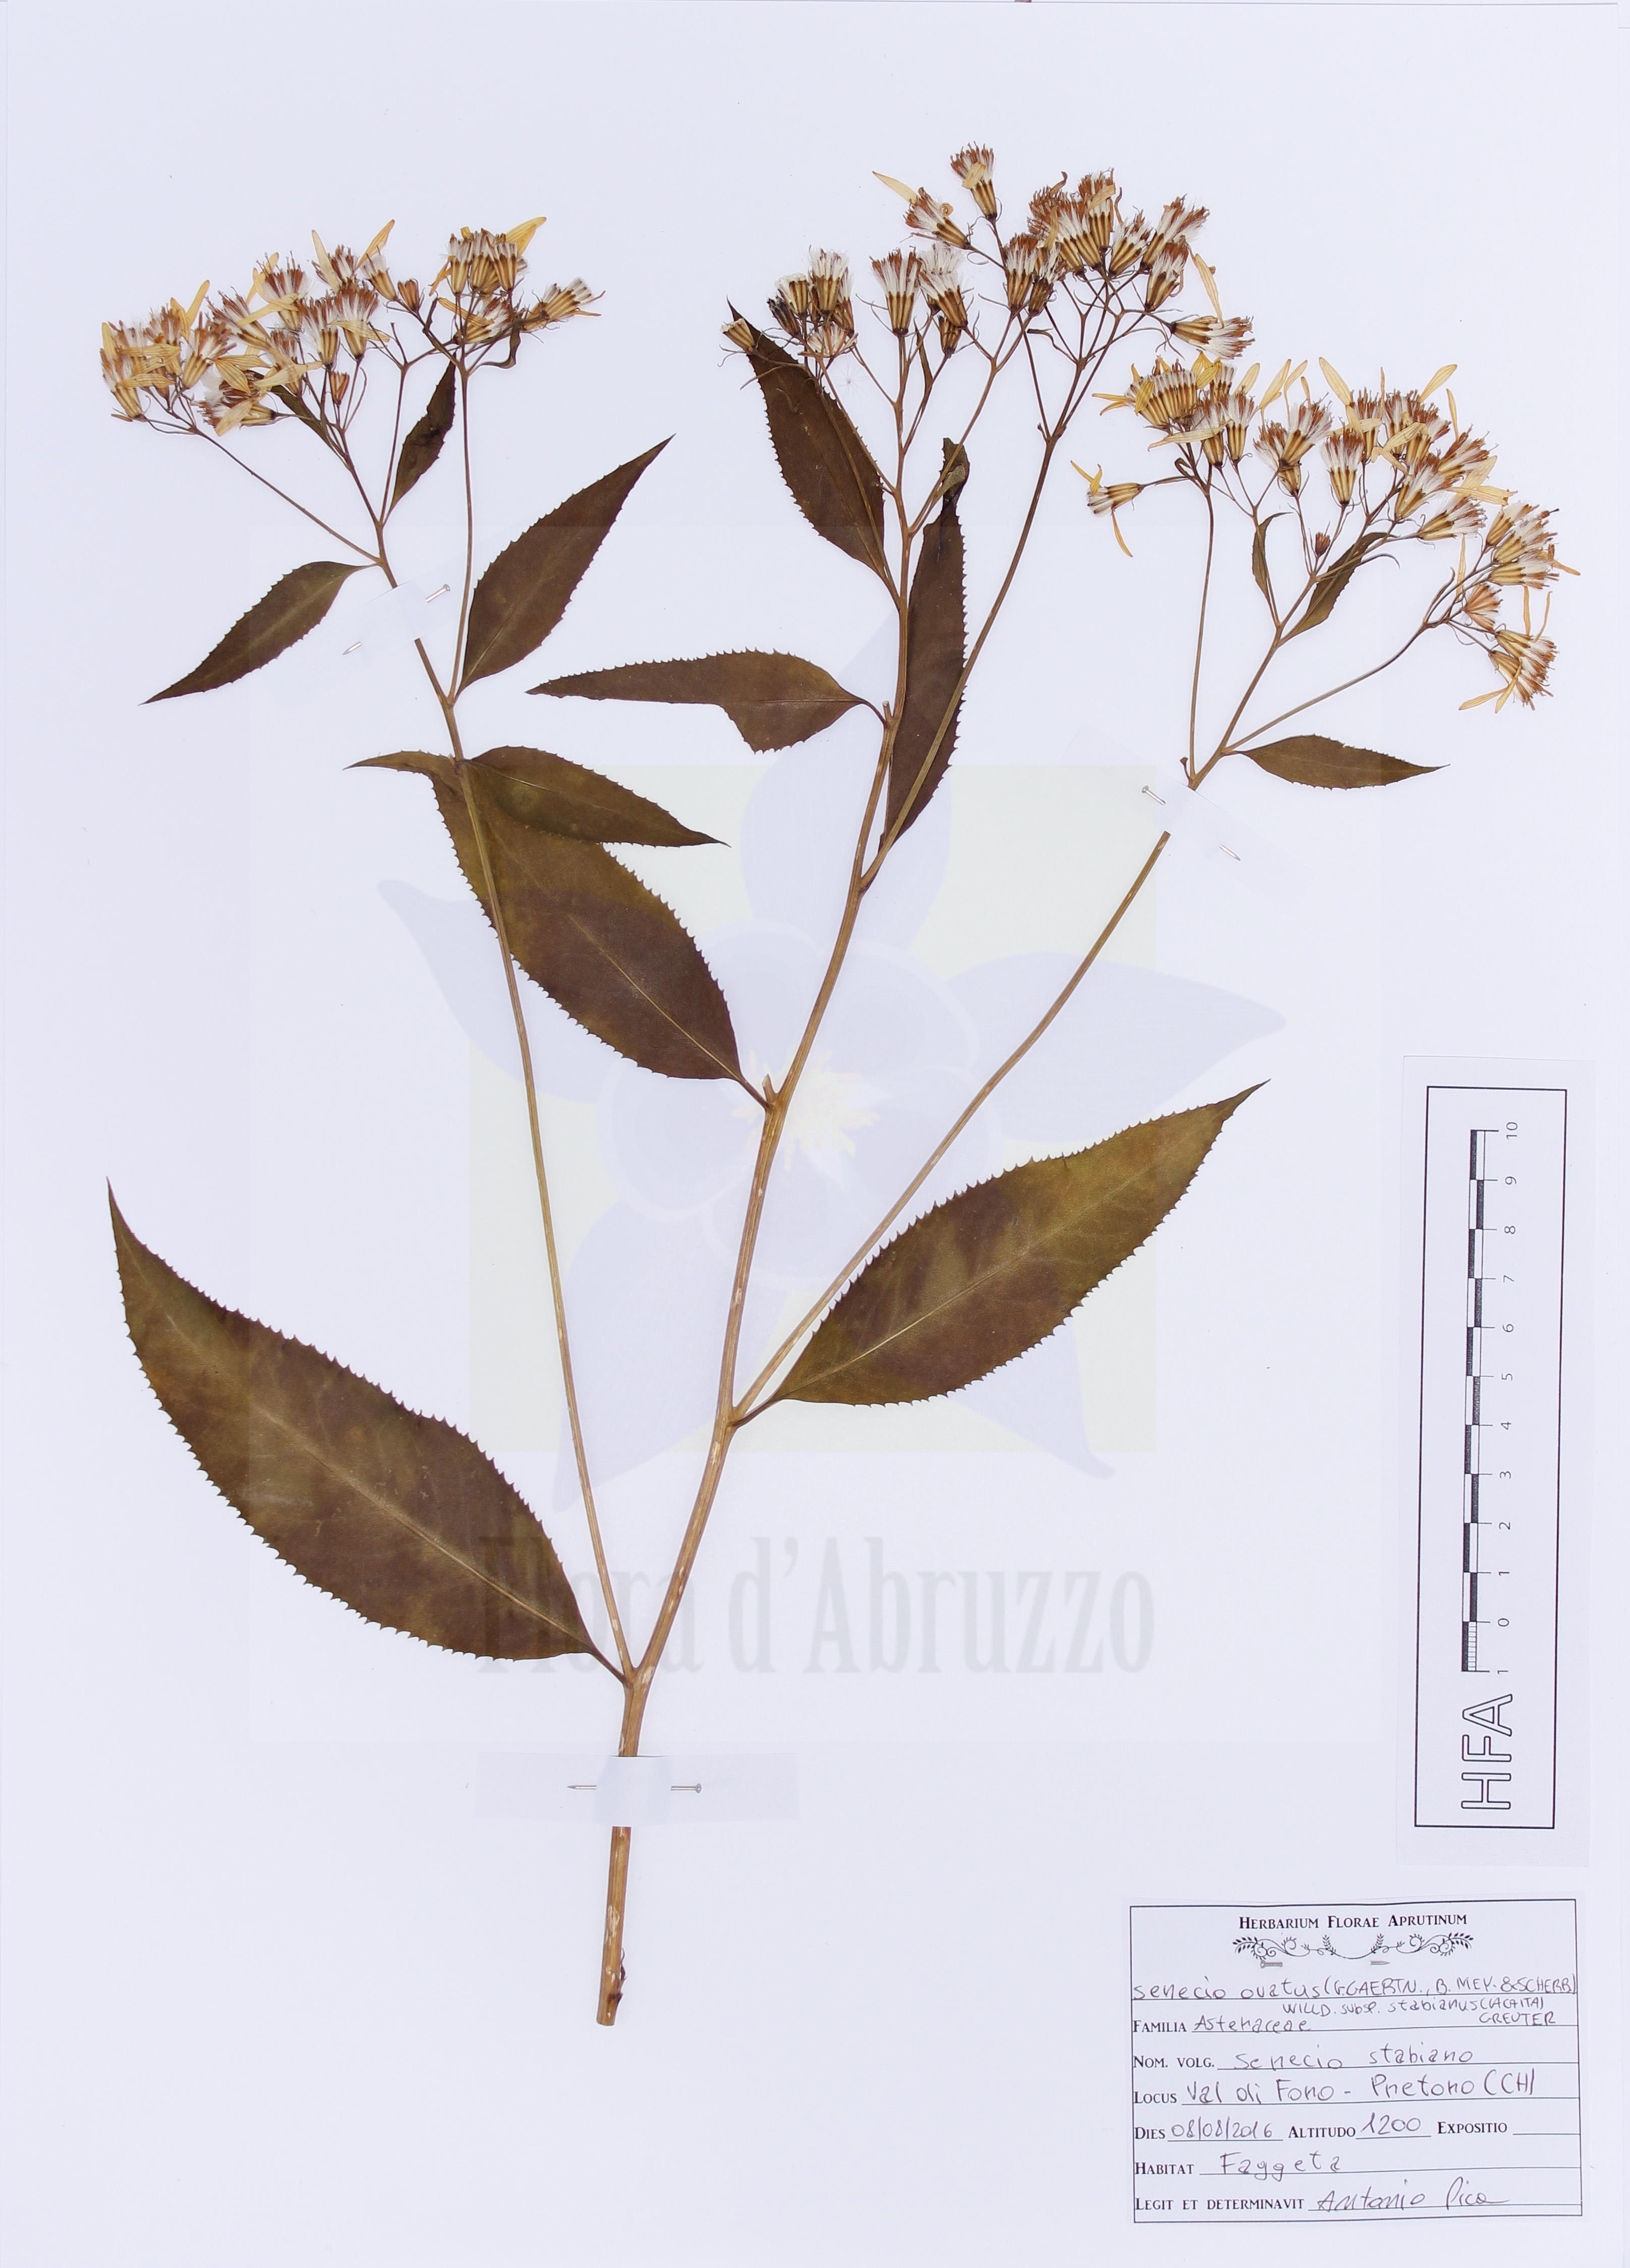 Senecio ovatus (G.Gaertn., B.Mey. & Scherb.) Willd. subsp. stabianus (Lacaita) Greuter